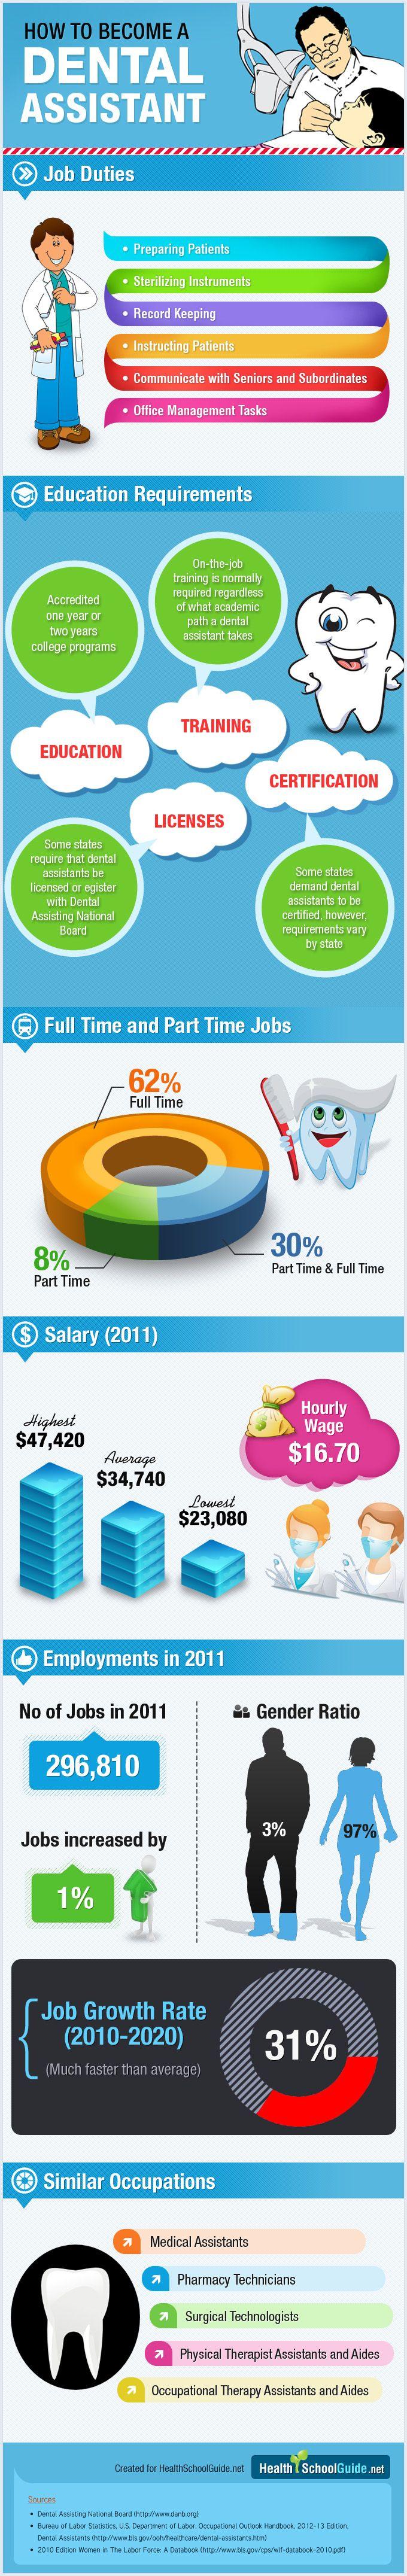 Hygienist Images On Pinterest  Other  Dental  Hygiene, Dental Hygienist And Study Guides